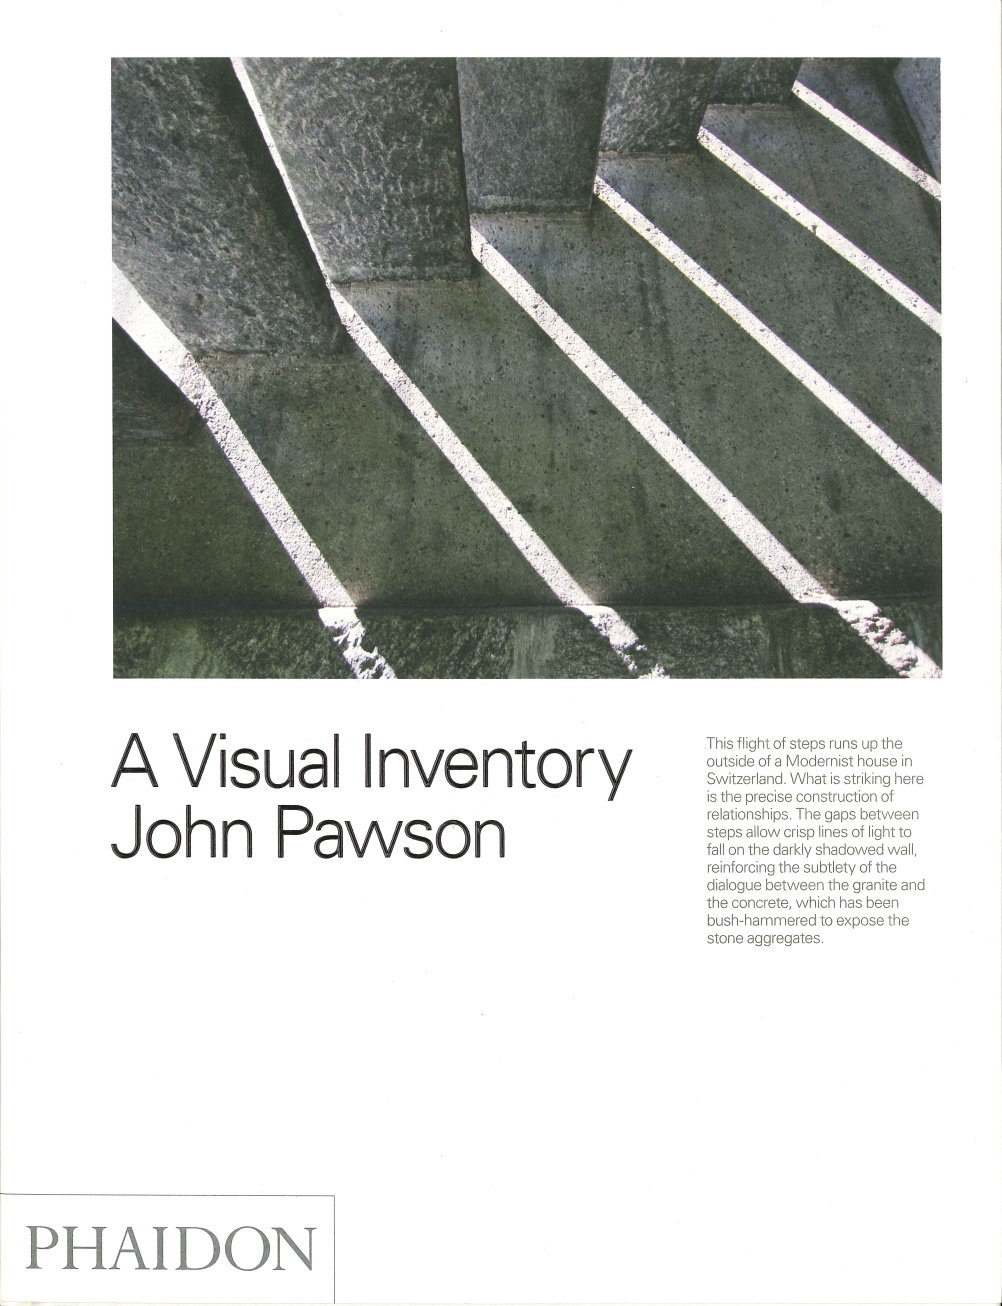 Paul Smith has chosen A Visual Inventory by John Pawson